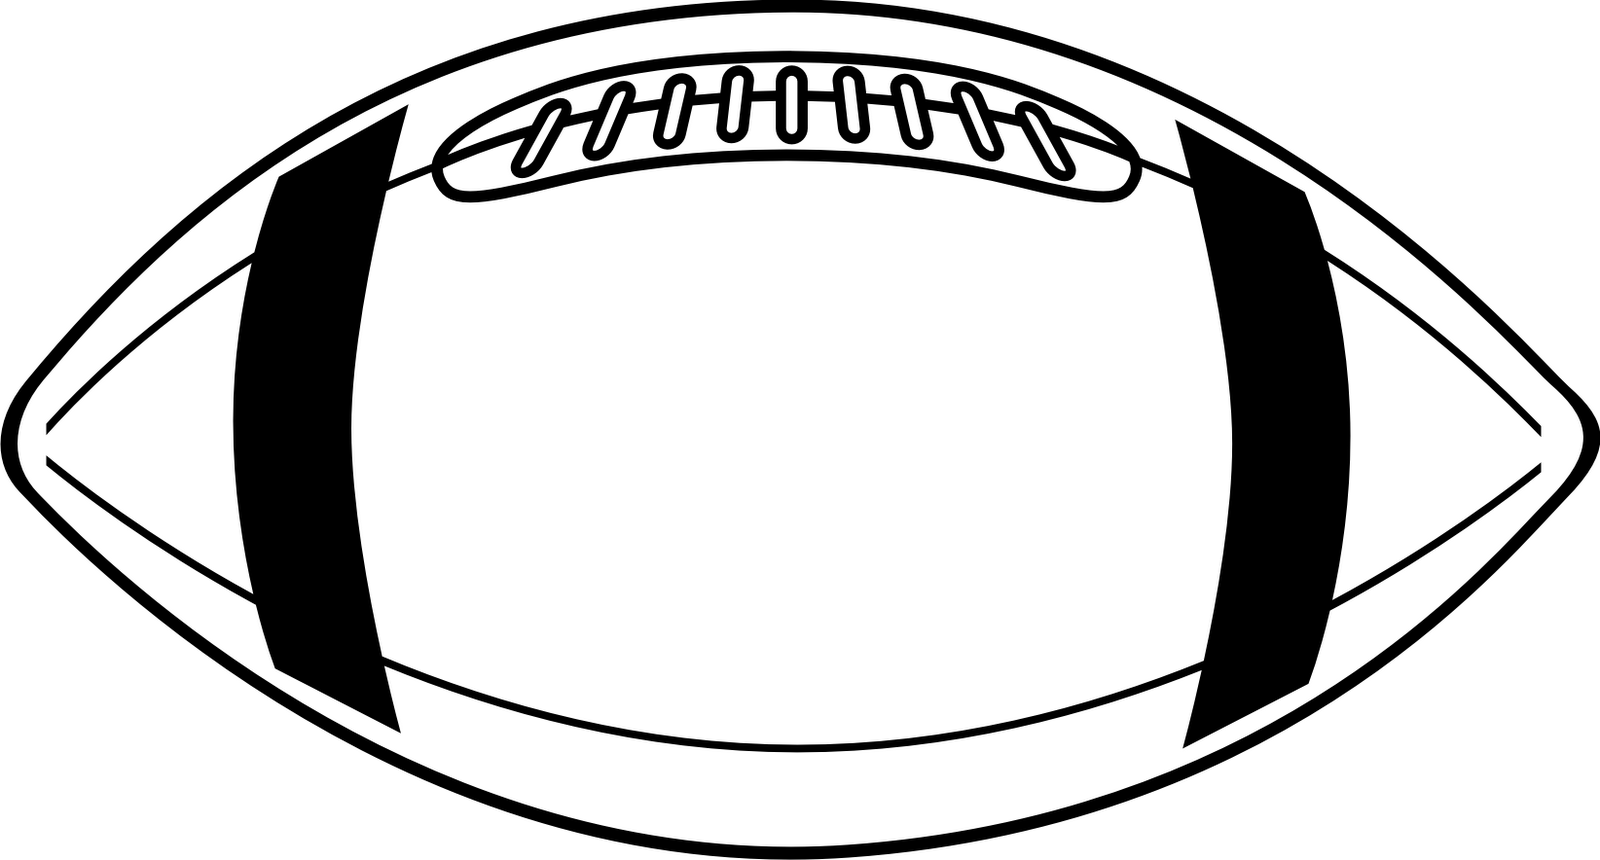 1600x860 Free Clipart Football Helmet Outline Clipartfox 3